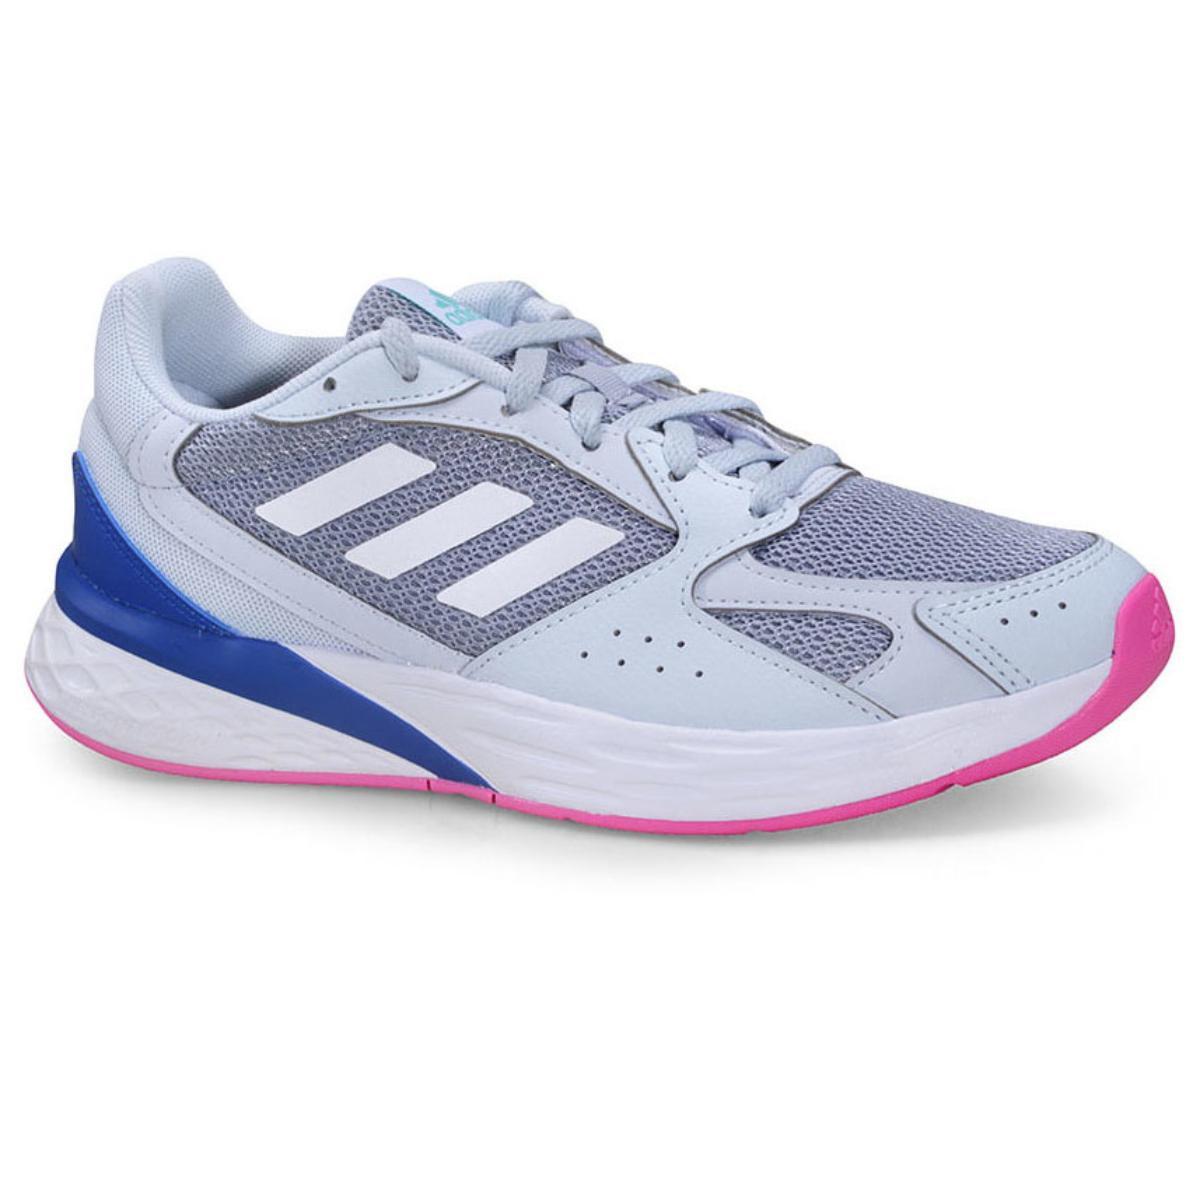 Tênis Feminino Adidas Fy9590 Response Classic Azul Claro/rosa